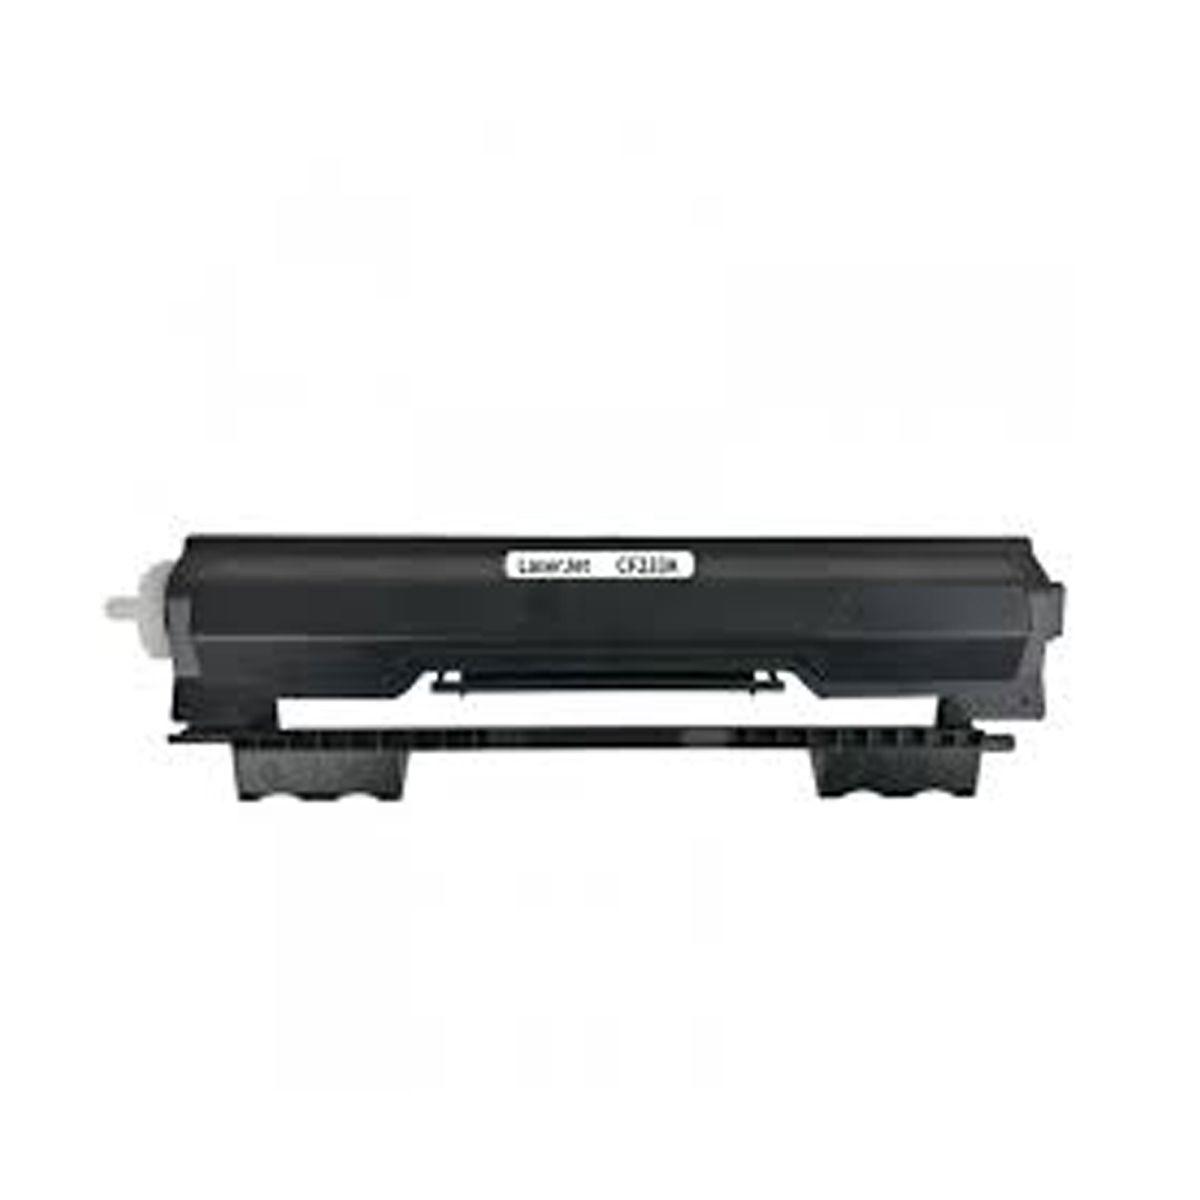 Toner CF233A CF233 33A - M106 M134 M106W M134A M134FN 106W 134A 134FN